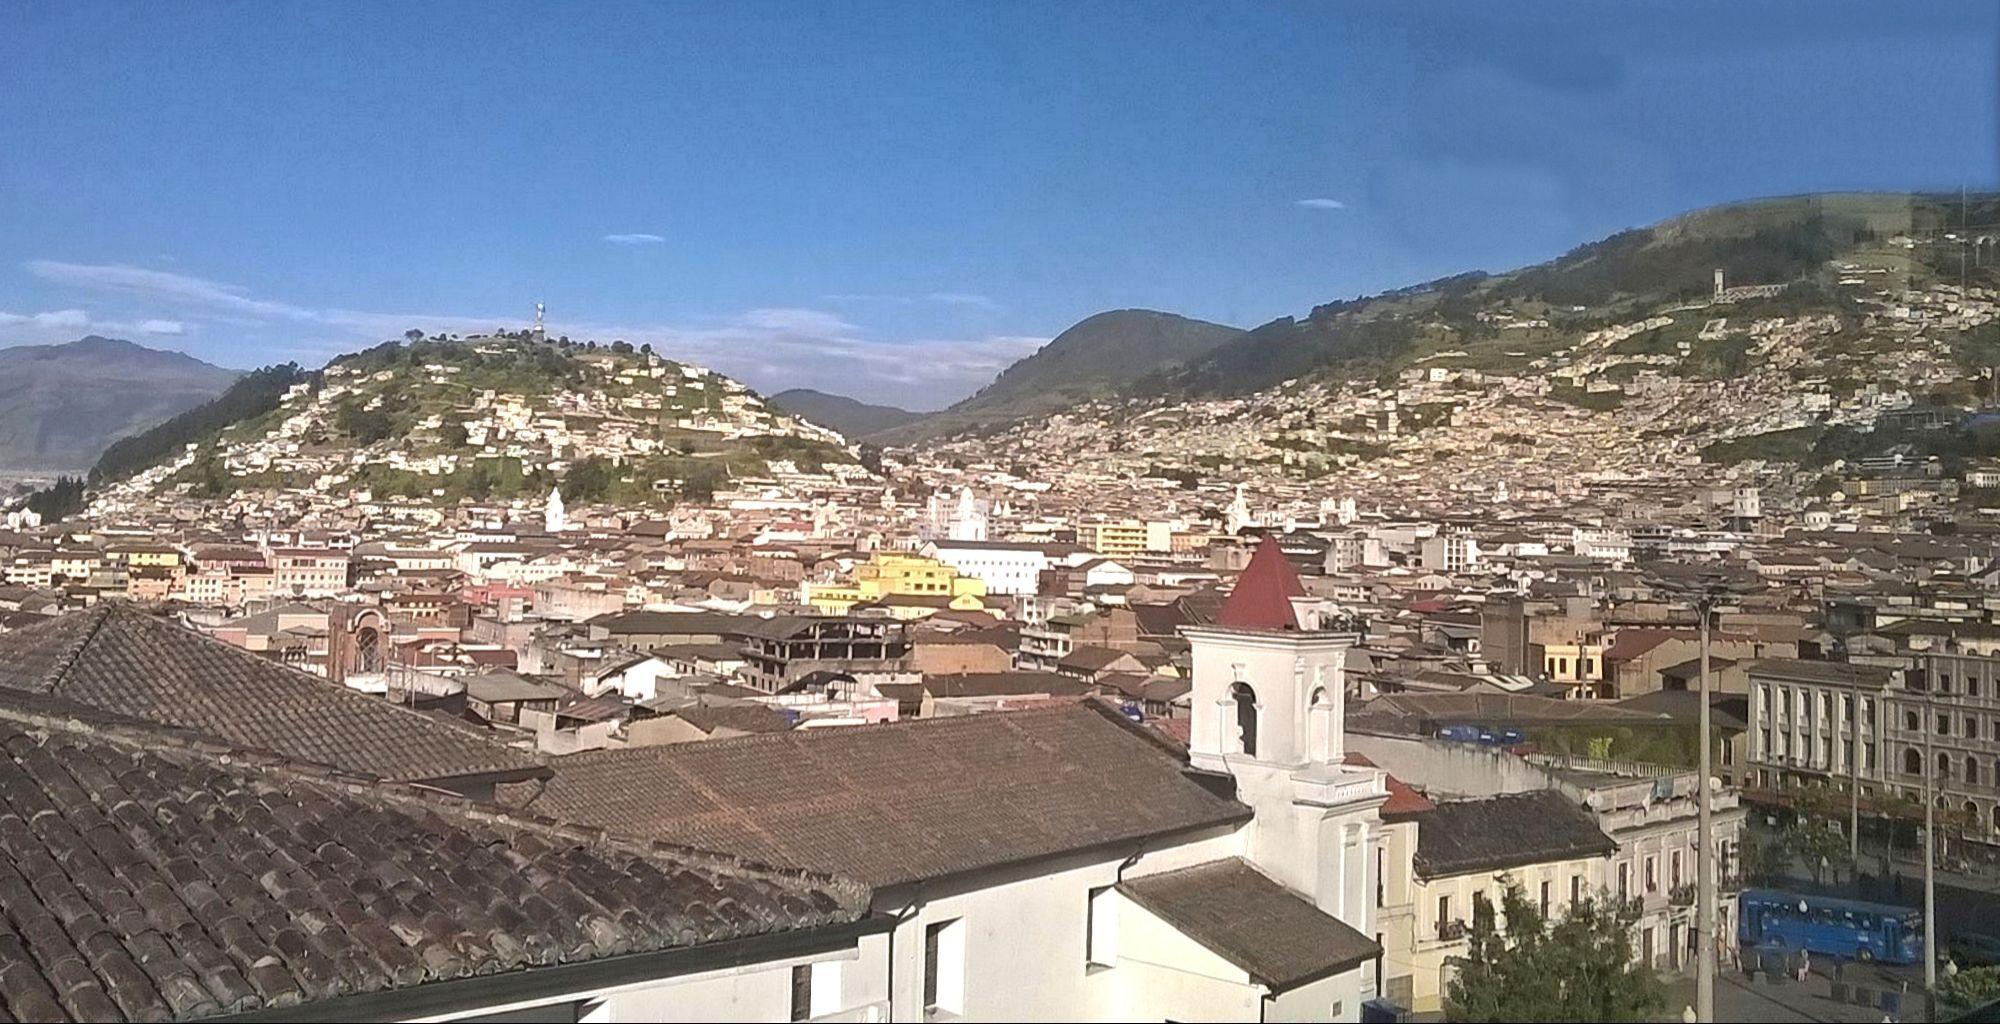 Overlooking Quito